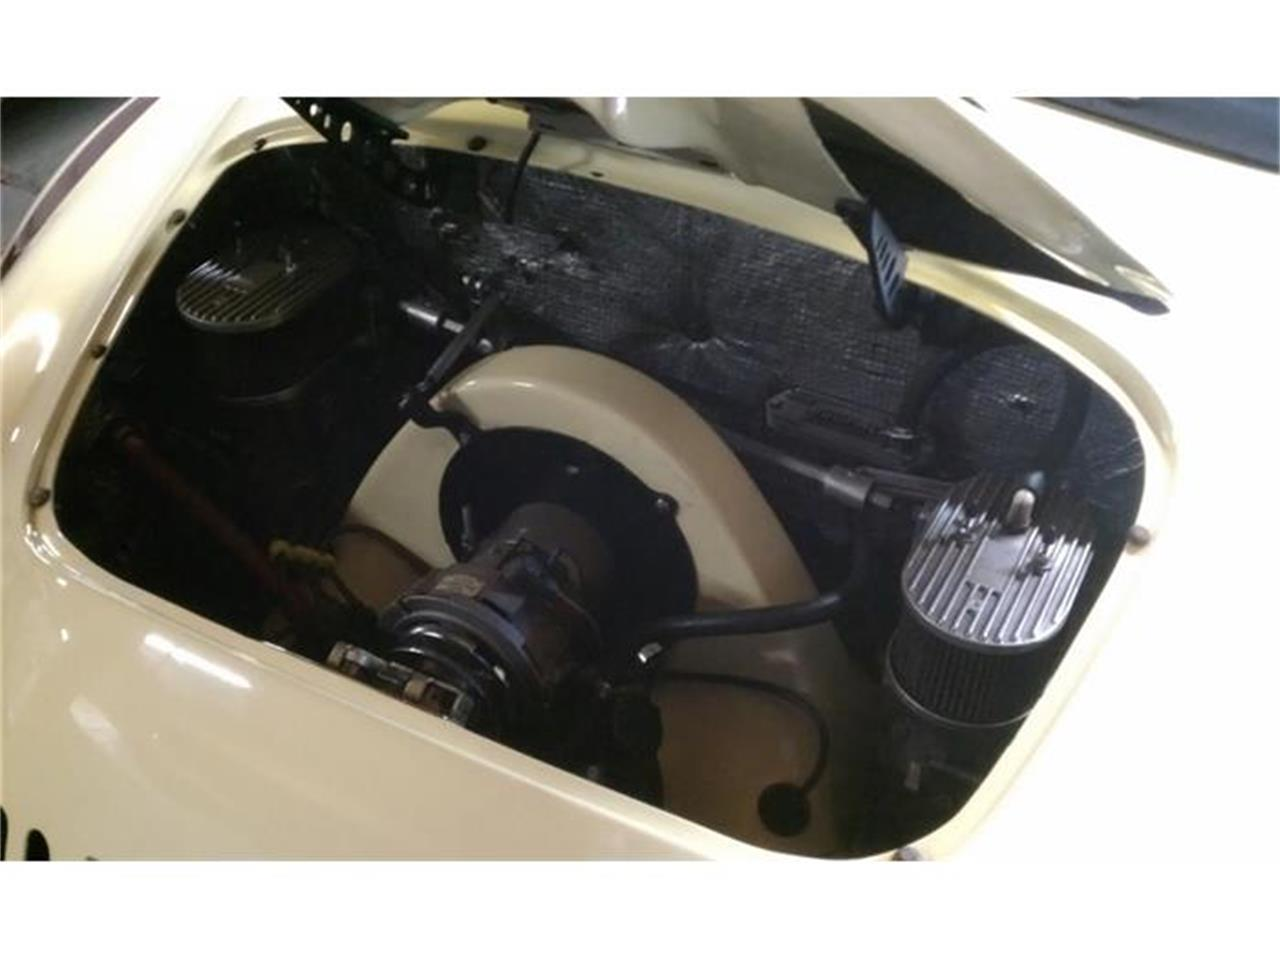 Large Picture of 1957 Porsche Speedster located in San Diego California - $29,950.00 - BVG3